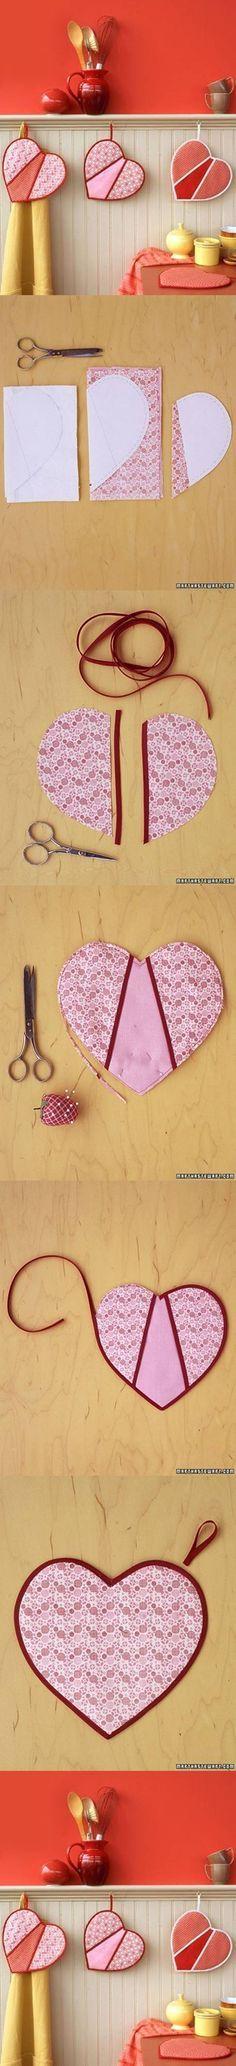 DIY Heart Shaped Pot Holders DIY Projects   UsefulDIY.com Follow Us on Facebook --> https://www.facebook.com/UsefulDiy